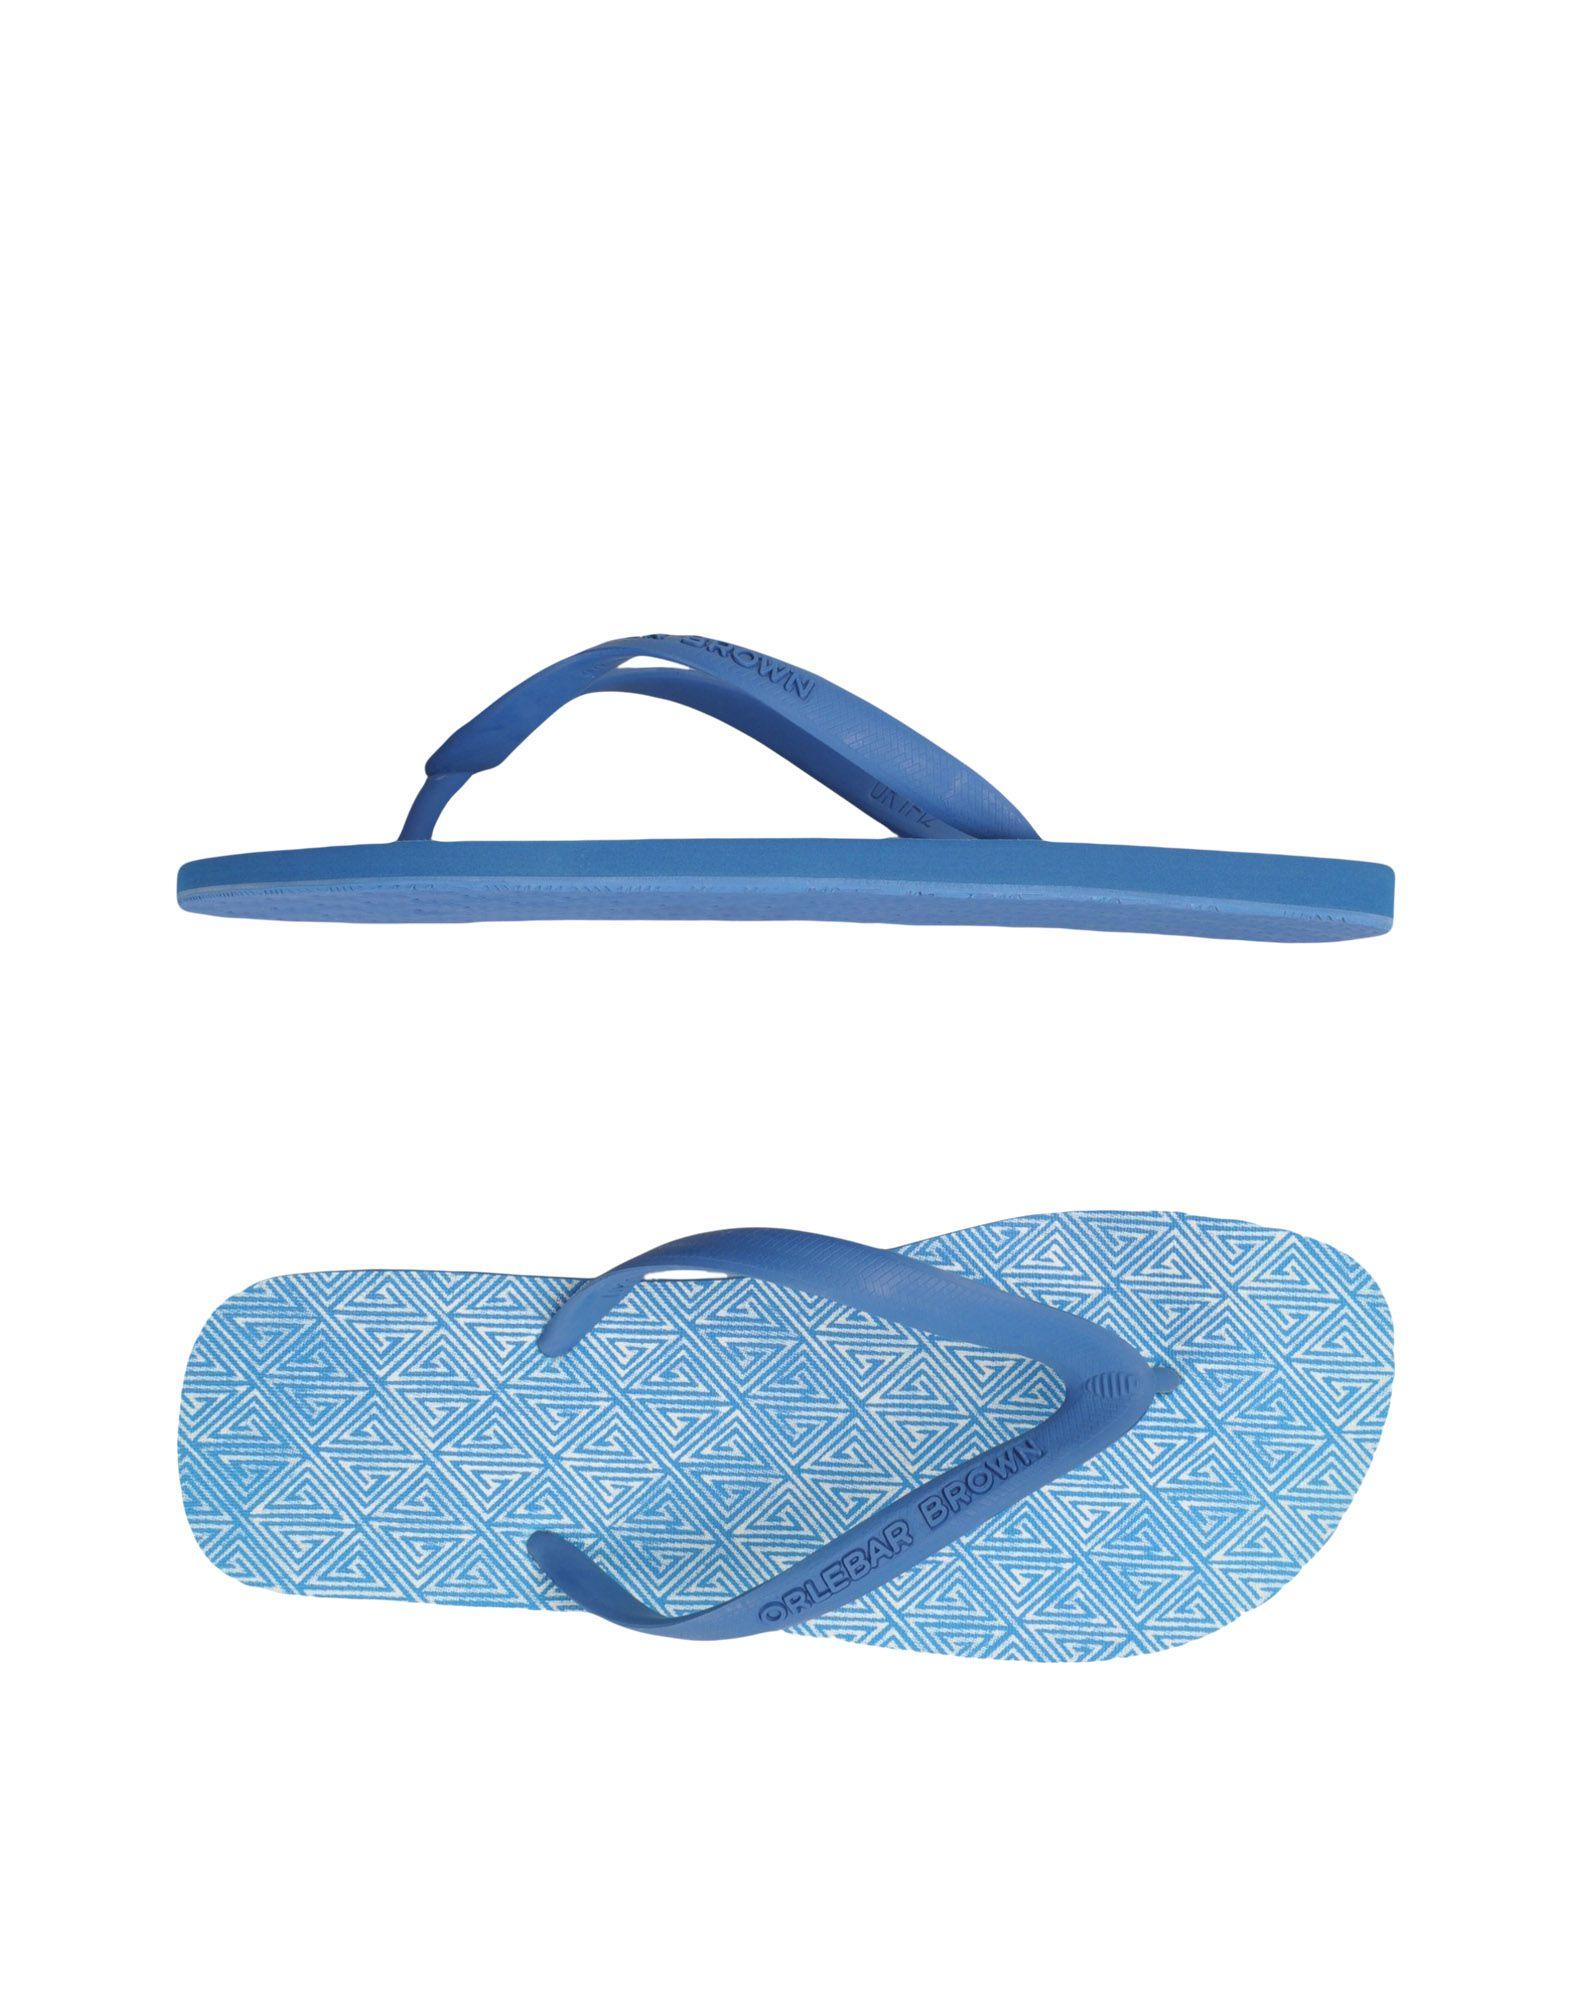 ORLEBAR BROWN メンズ トングサンダル ブルー 12 ゴム